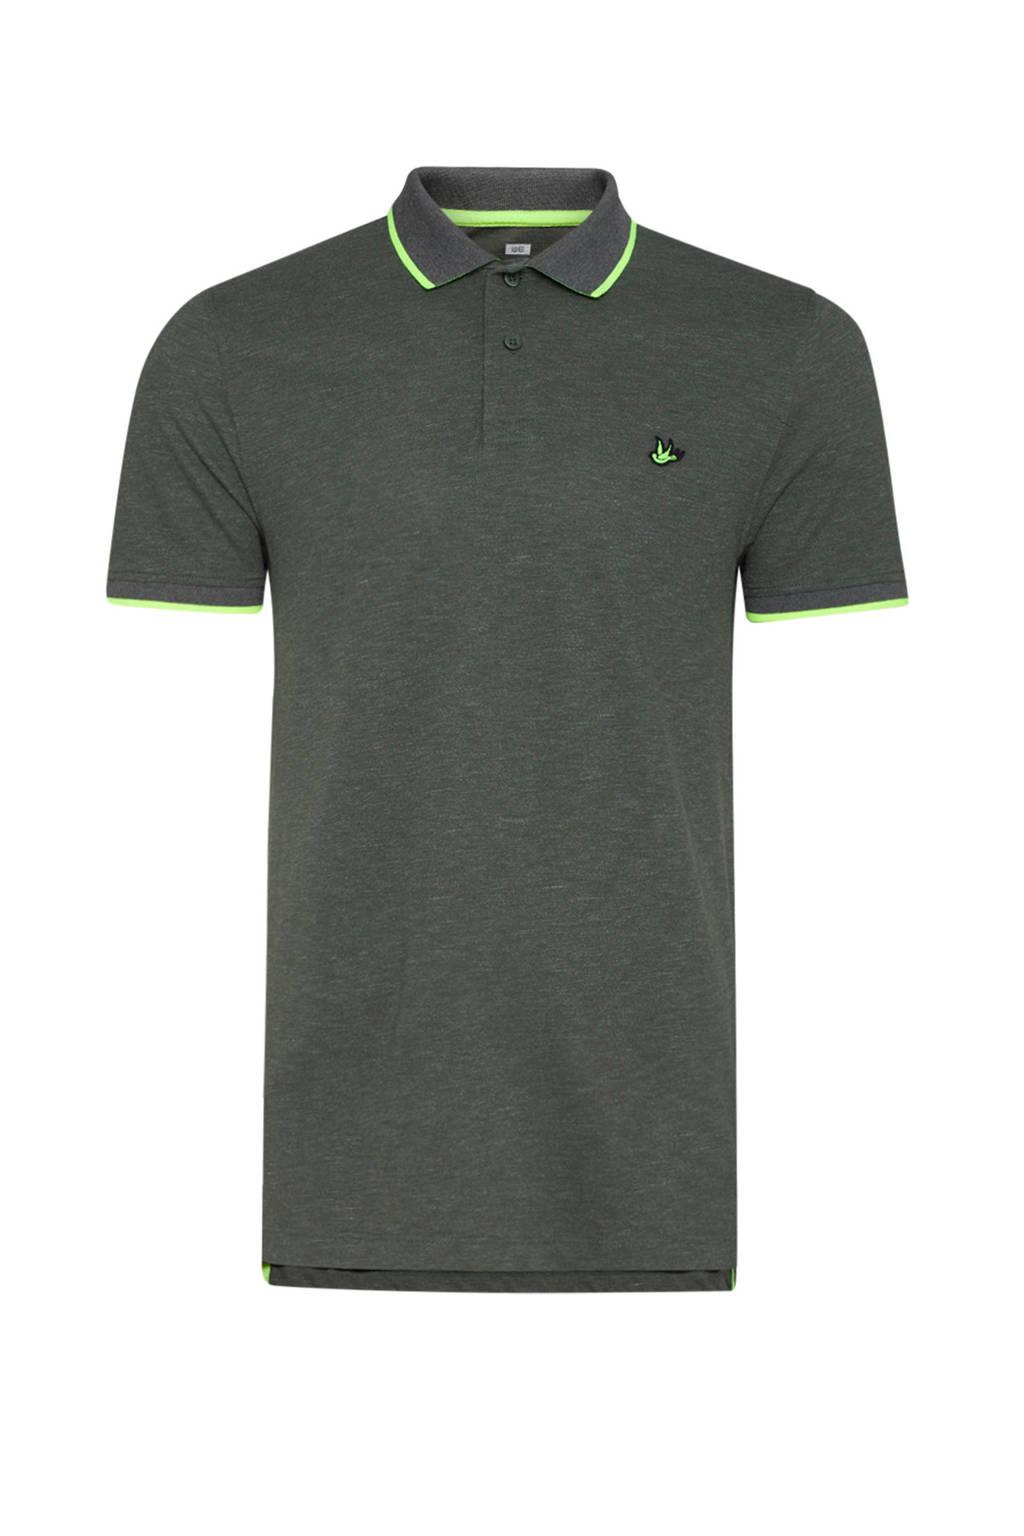 WE Fashion polo groen, Groen/lichtgroen